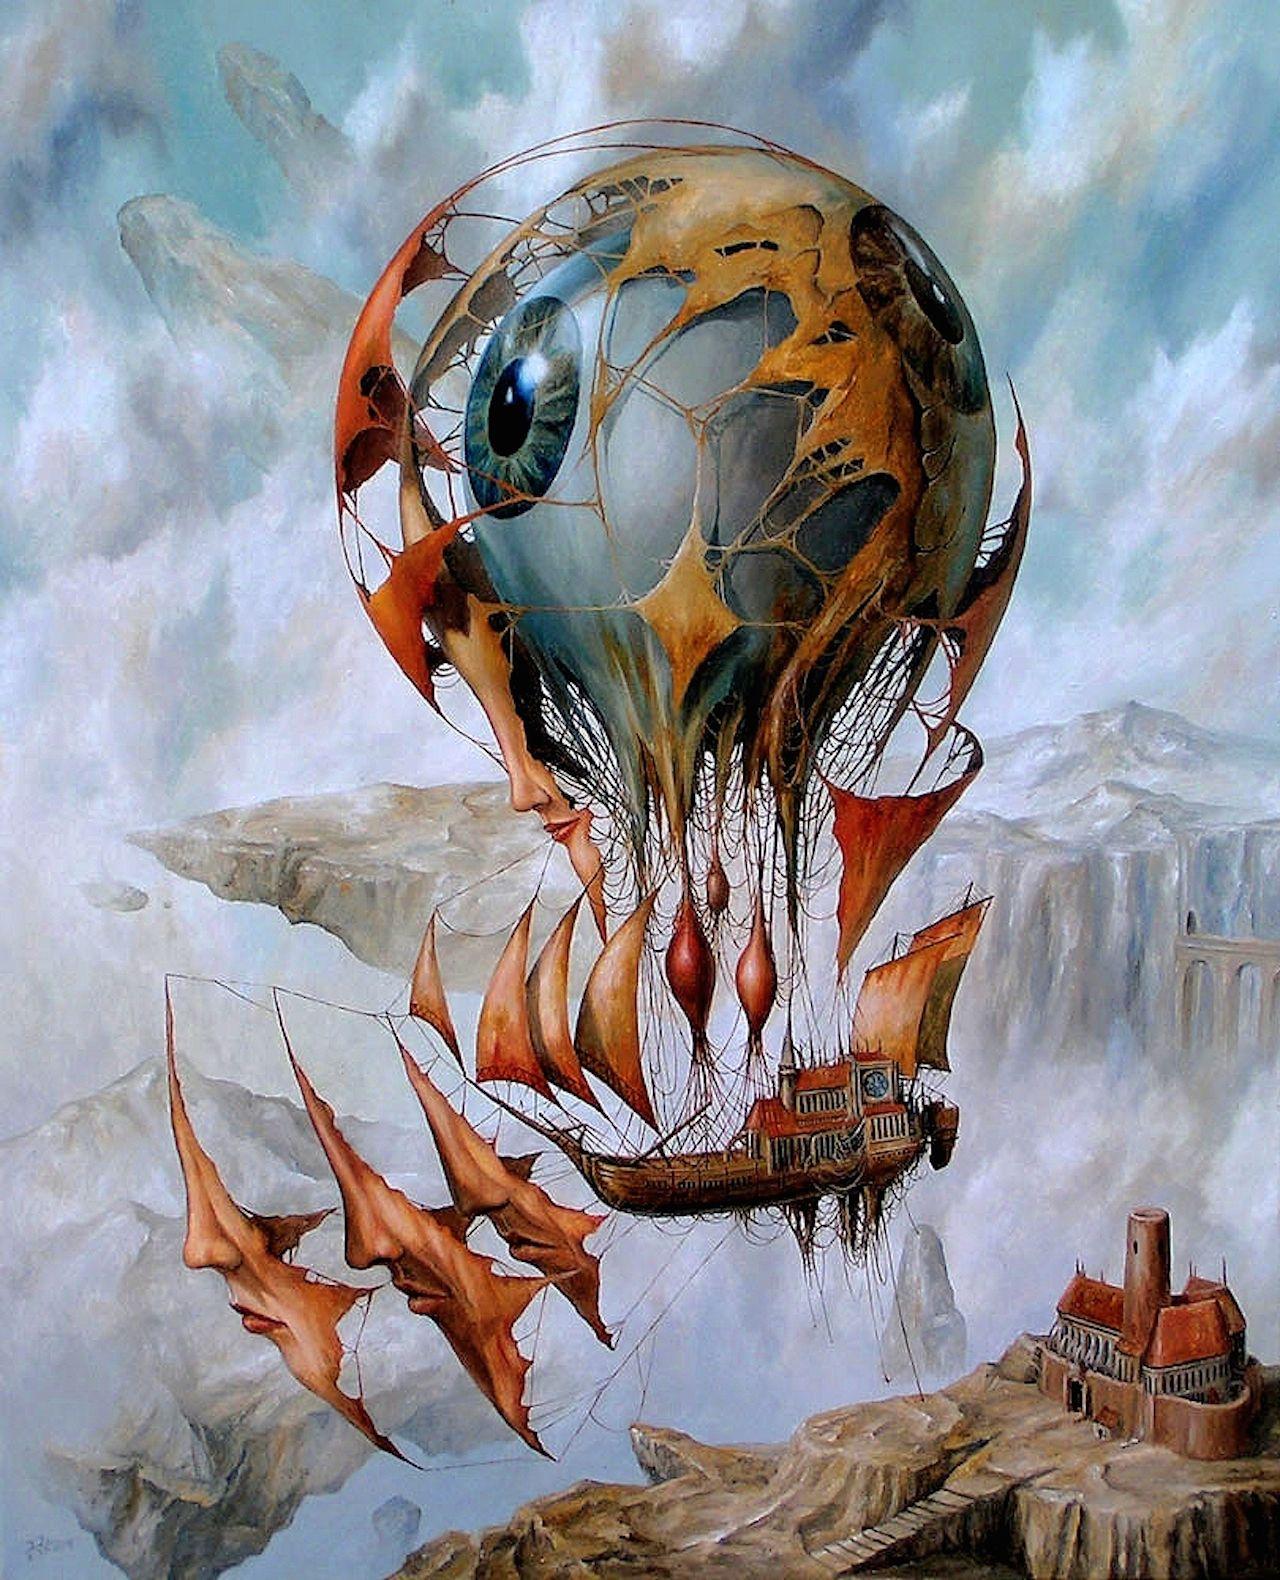 Jarosaw Janikowski Surreal Fantasy Digital